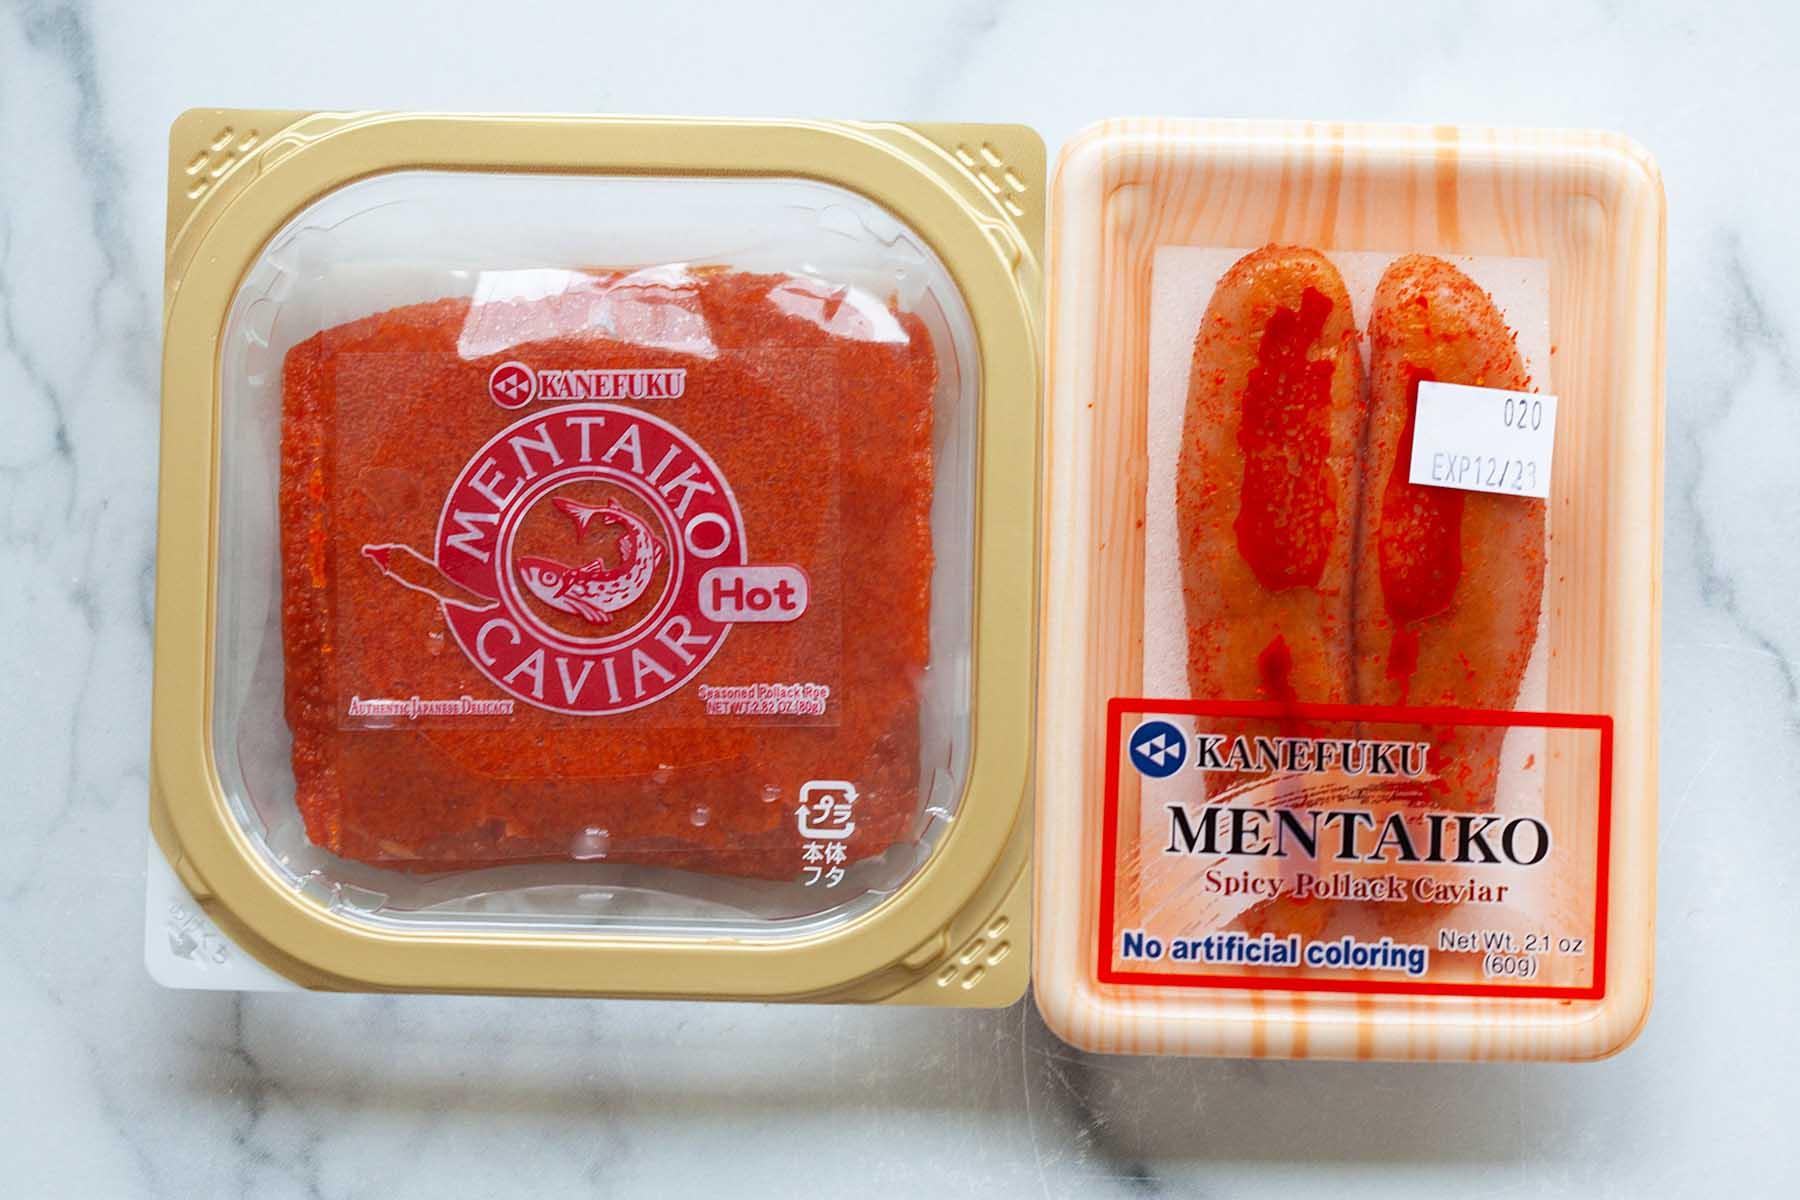 Meitako (Spicy pollock cod roe)